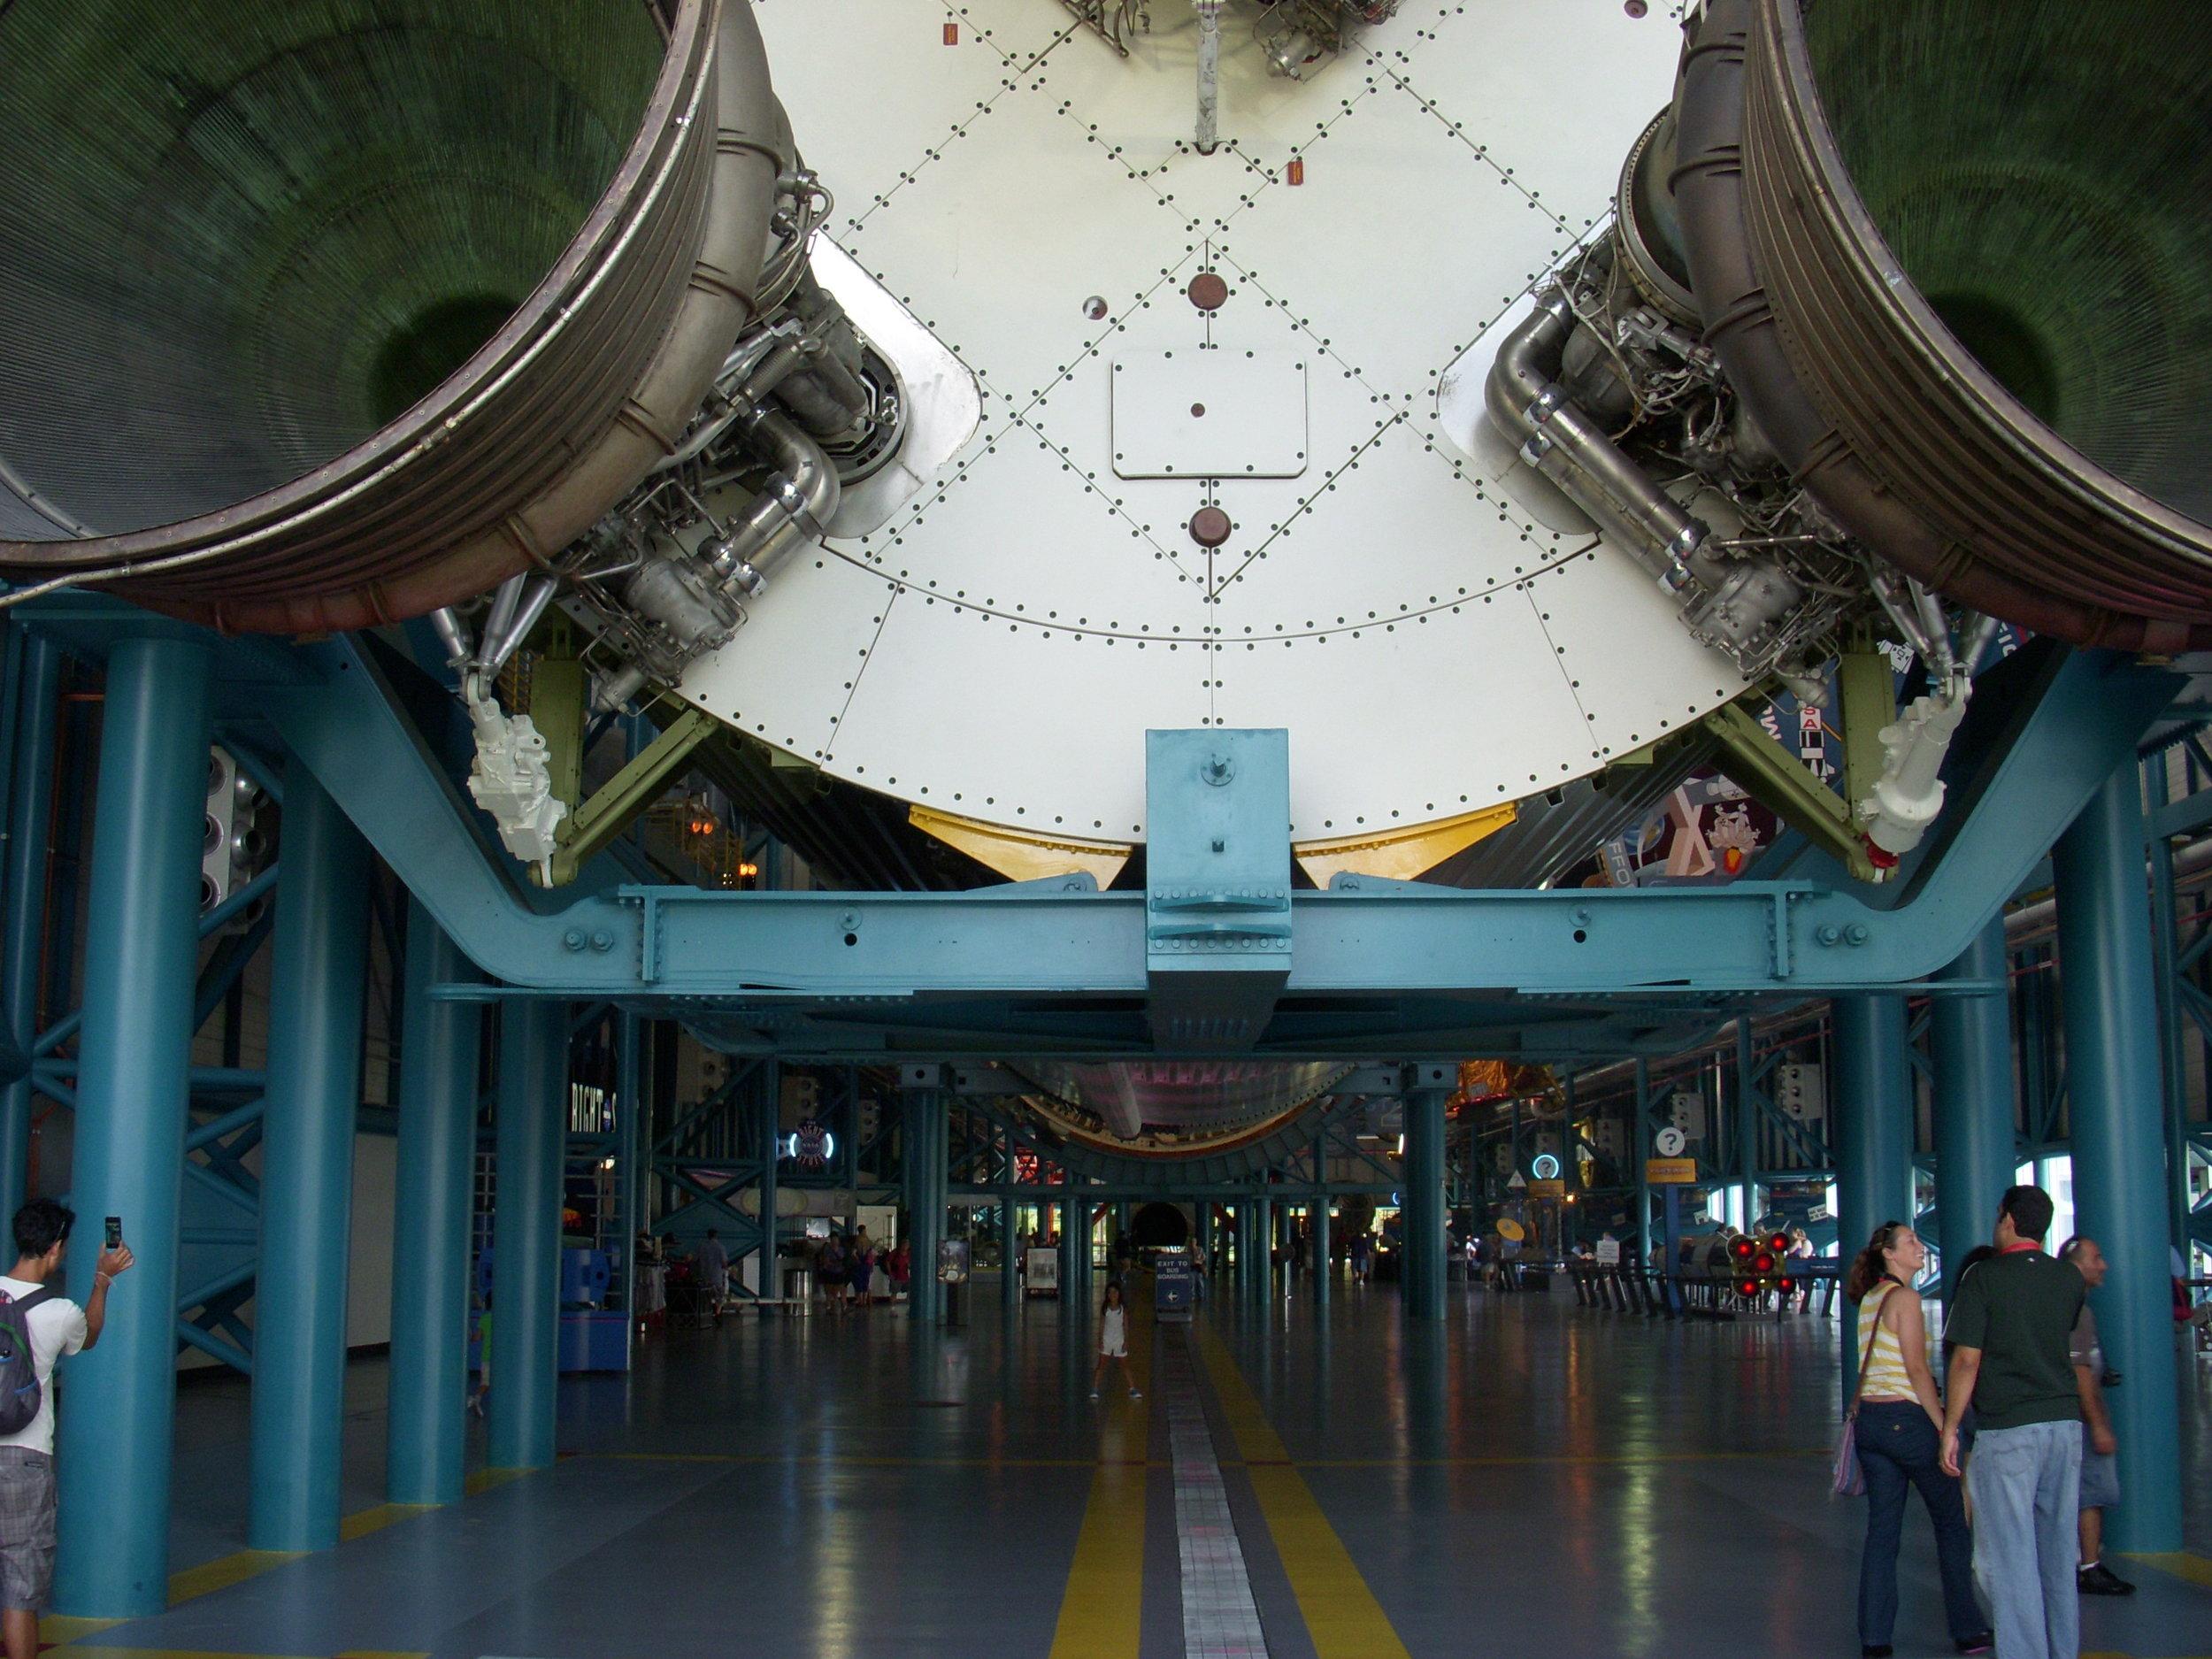 Very Large Rocket.